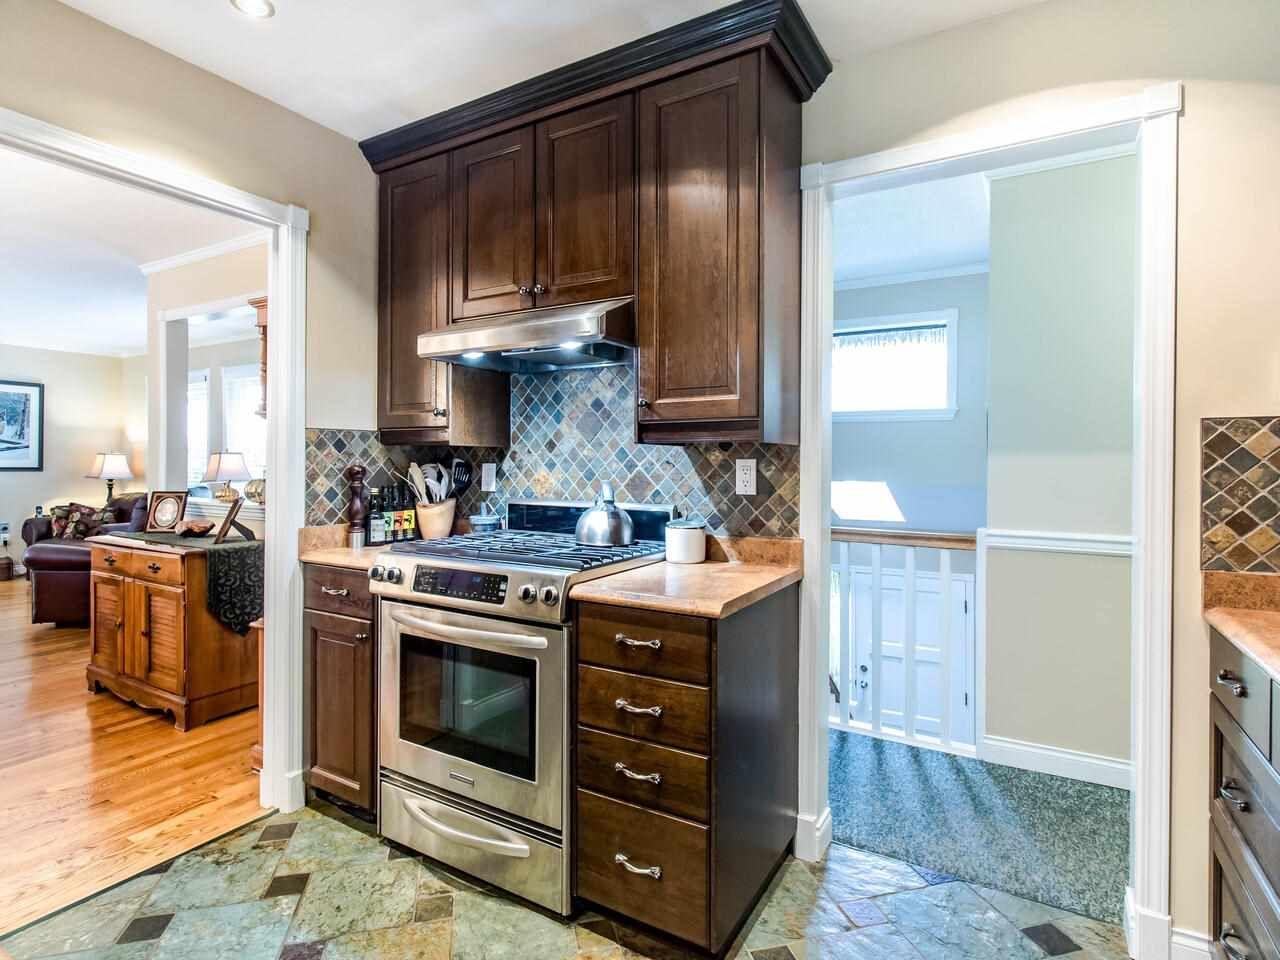 Photo 4: Photos: 11505 PEMBERTON Crescent in Delta: Annieville House for sale (N. Delta)  : MLS®# R2512135